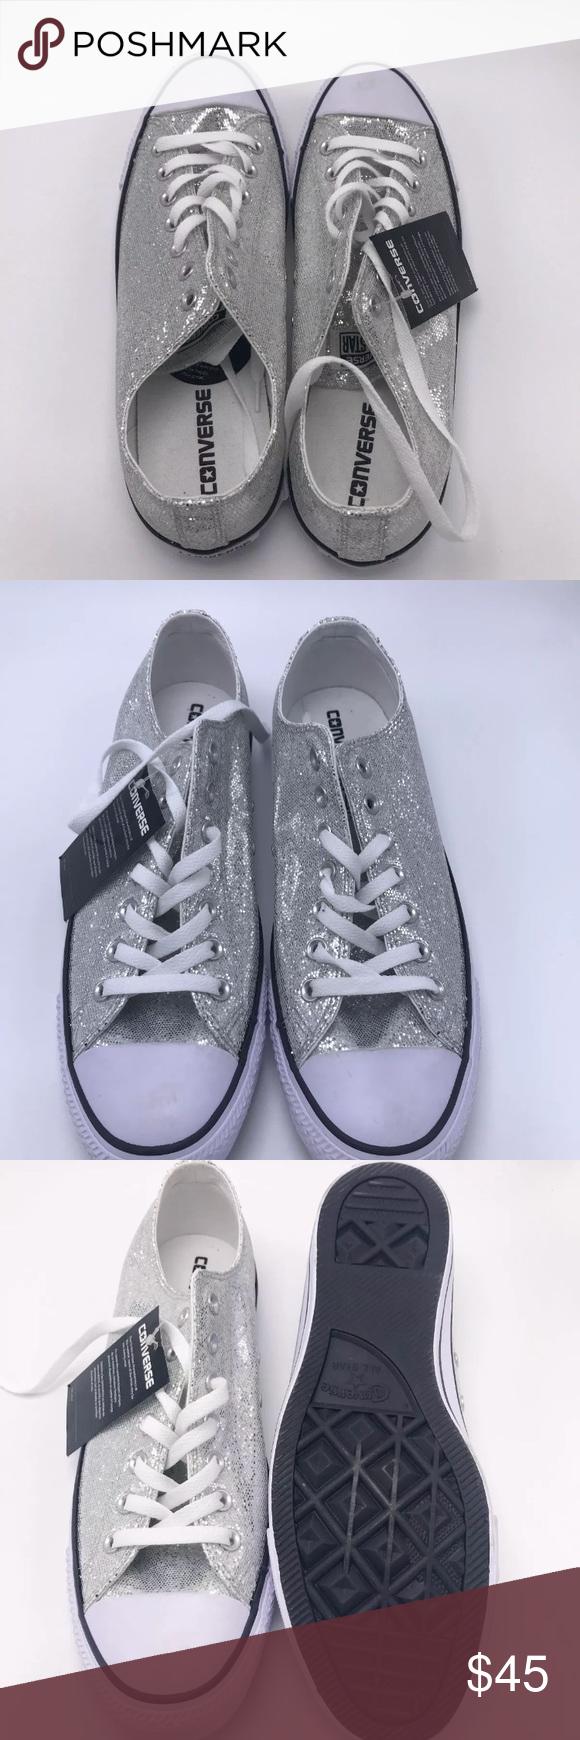 42362e35339 Converse Silver Sequin Converse Silver Sequin Size  13 (womens)  11(mens